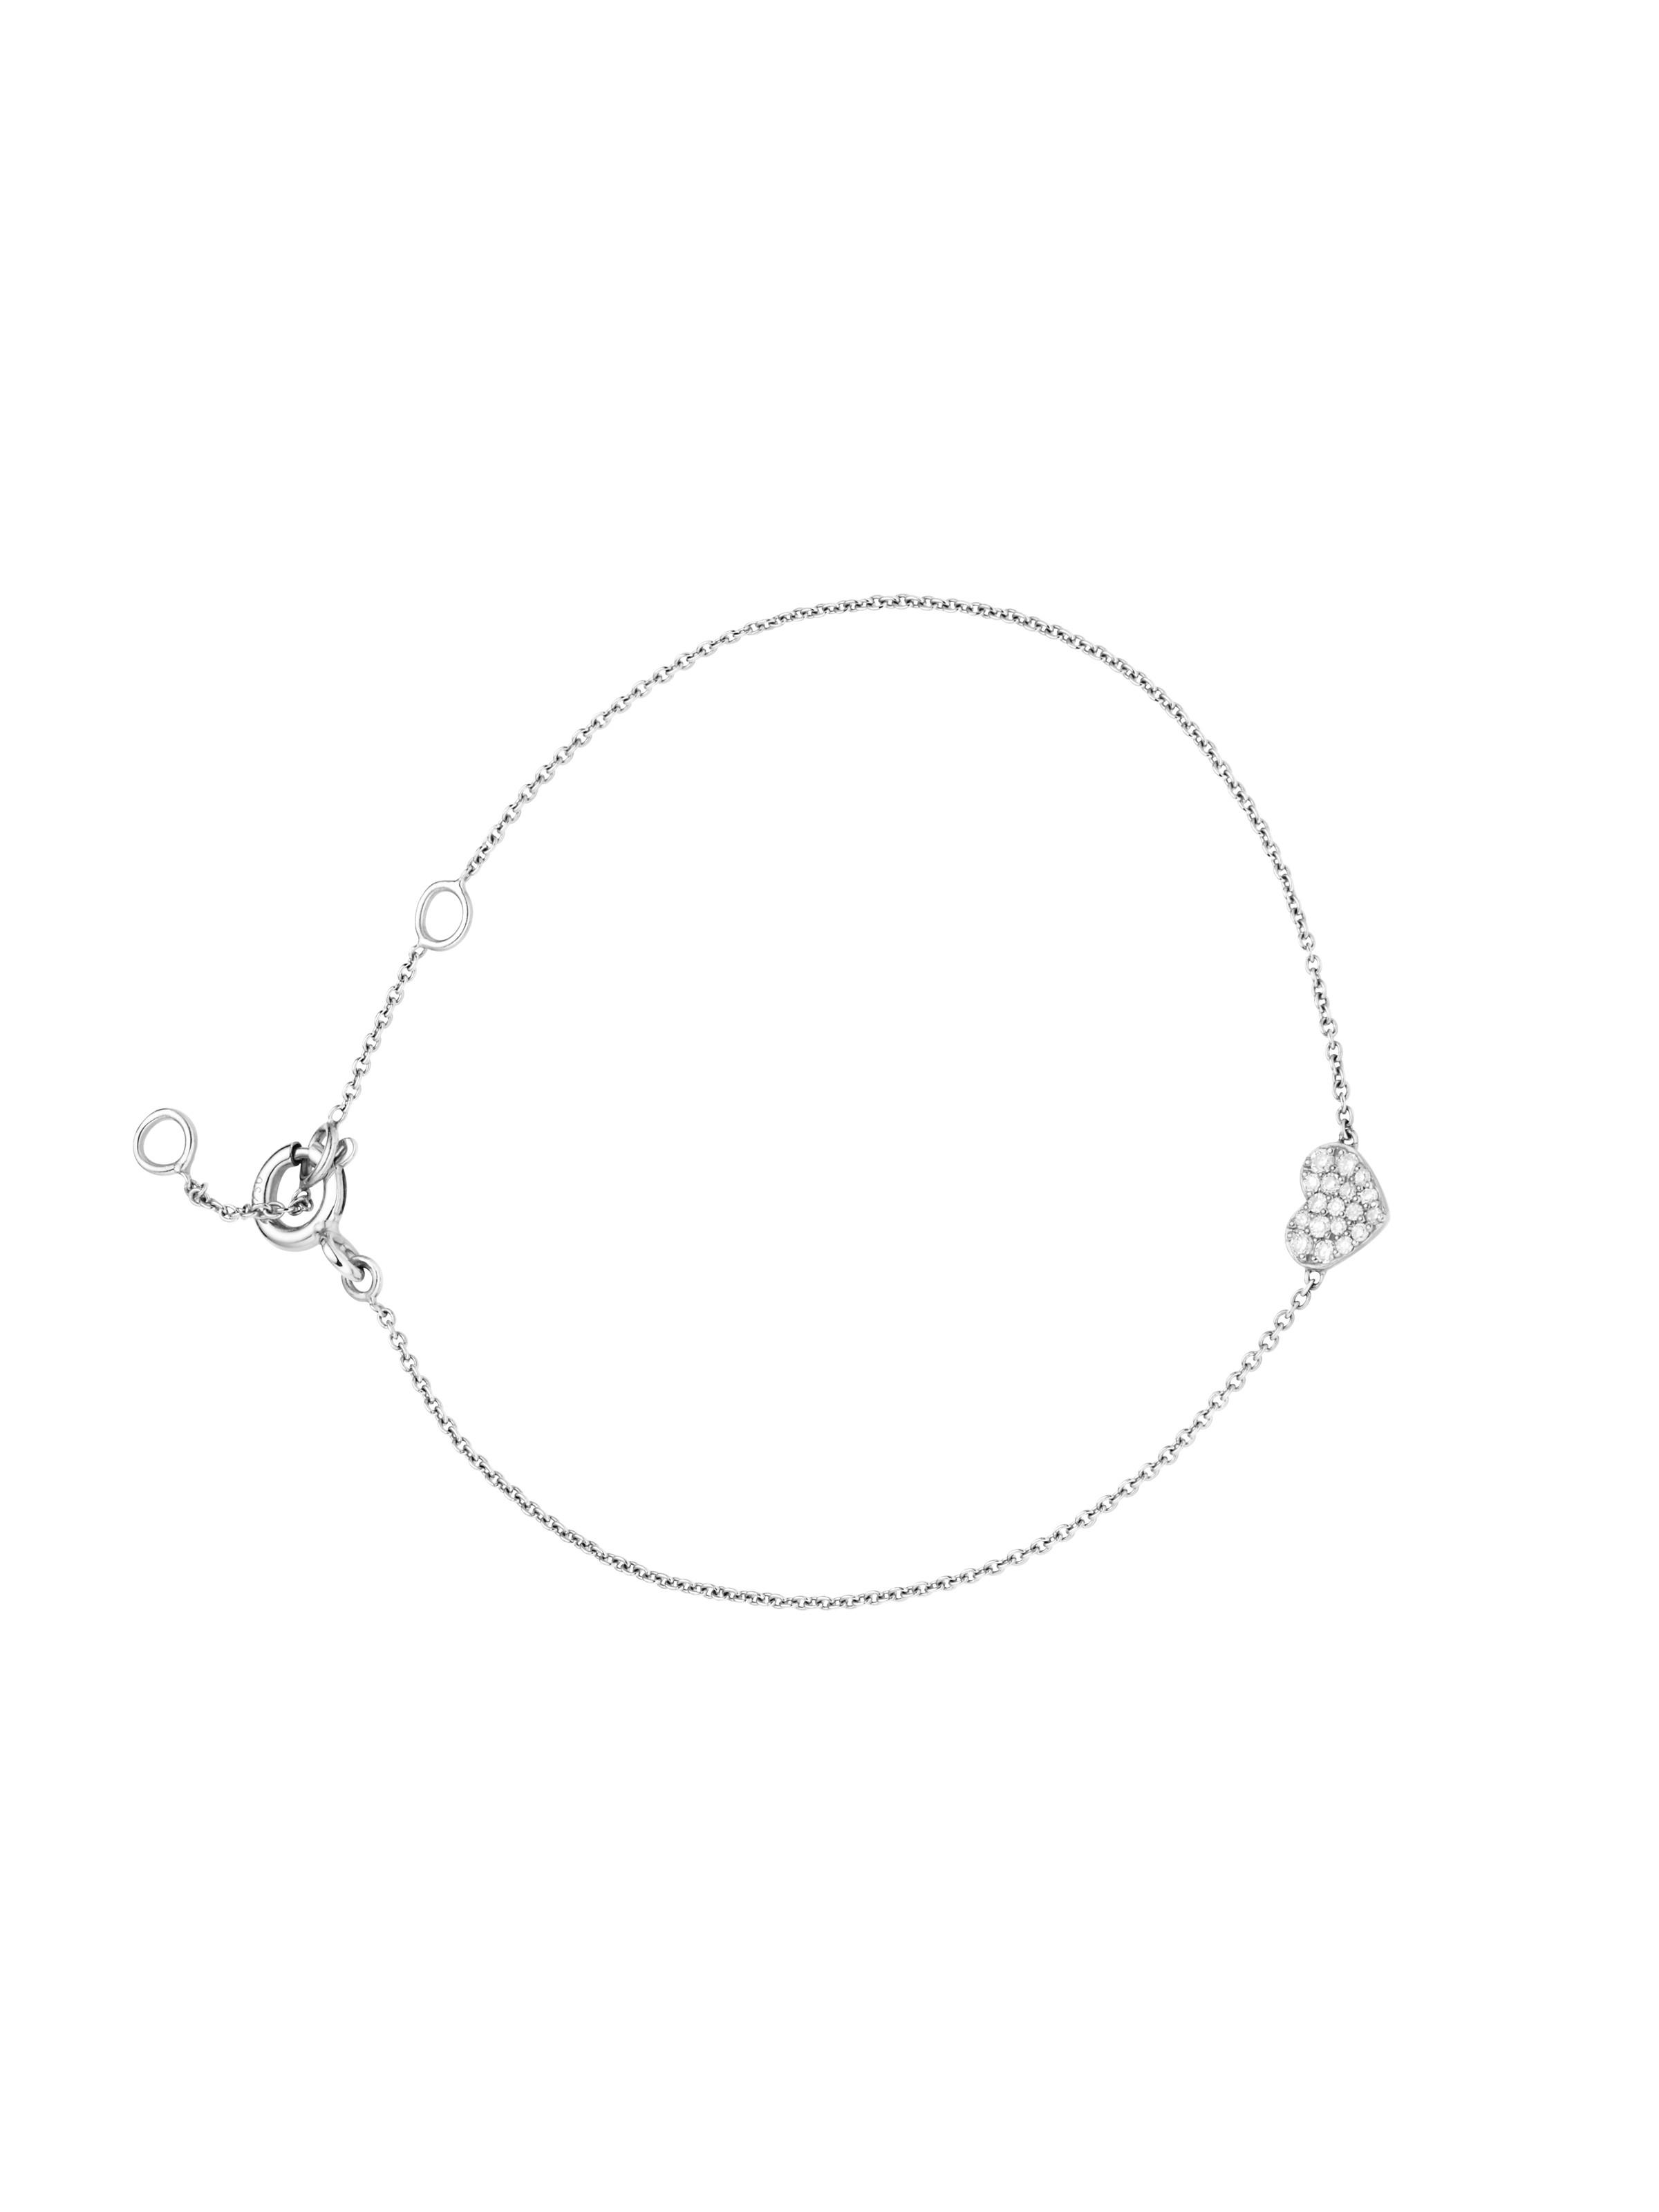 Minimalism bracelet